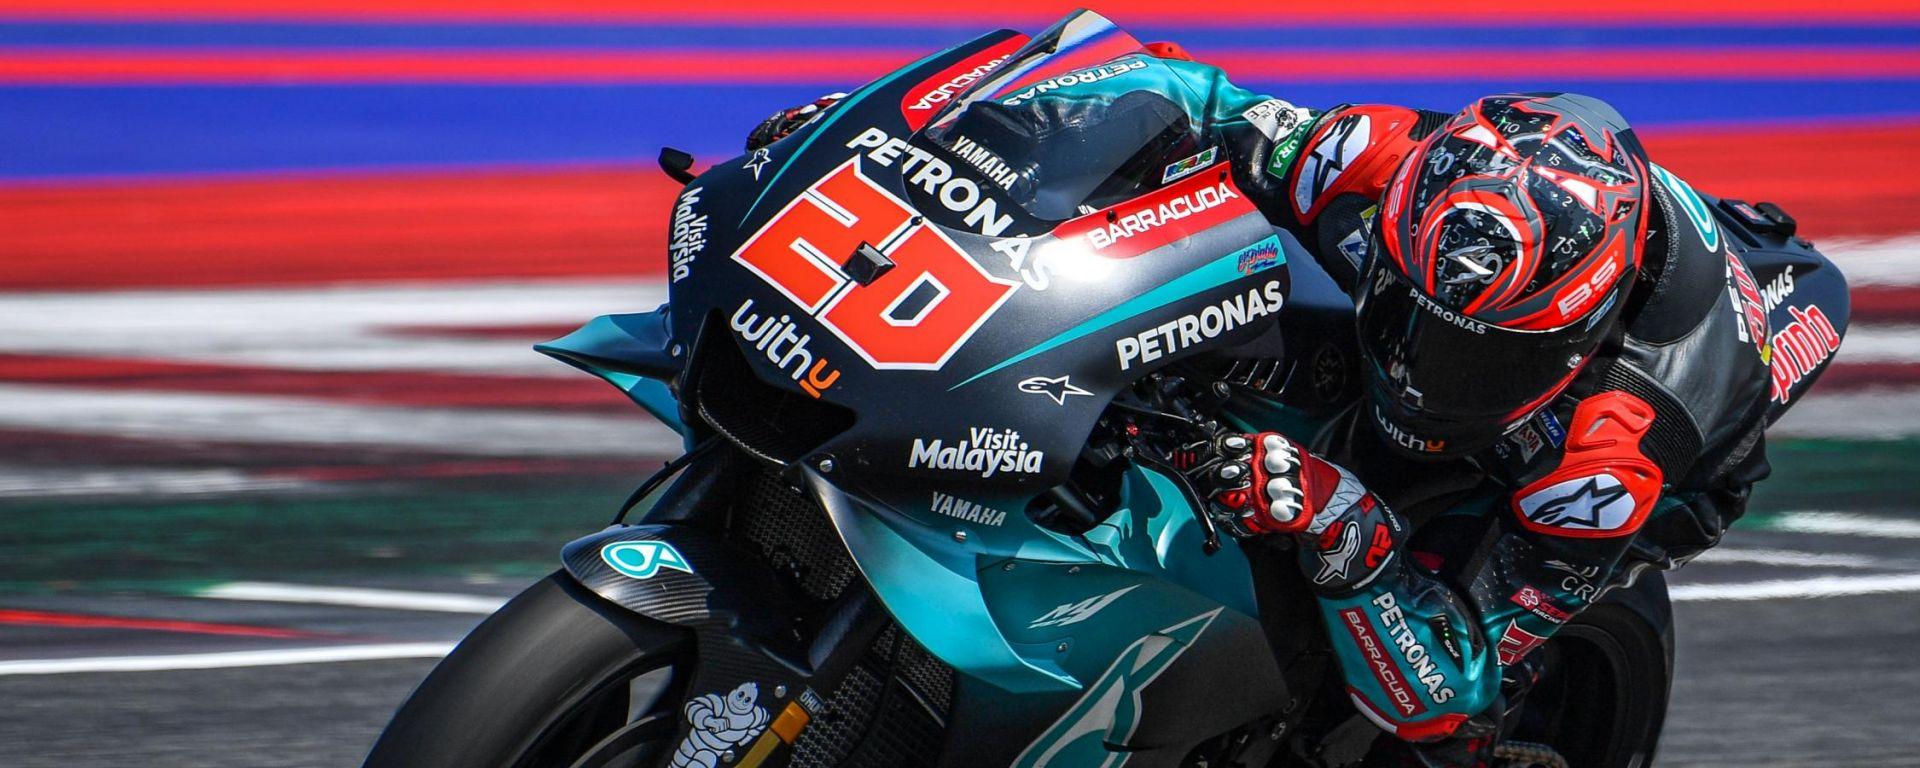 MotoGP Test Misano 2019, Fabio Quartararo (Yamaha Petronas SRT)